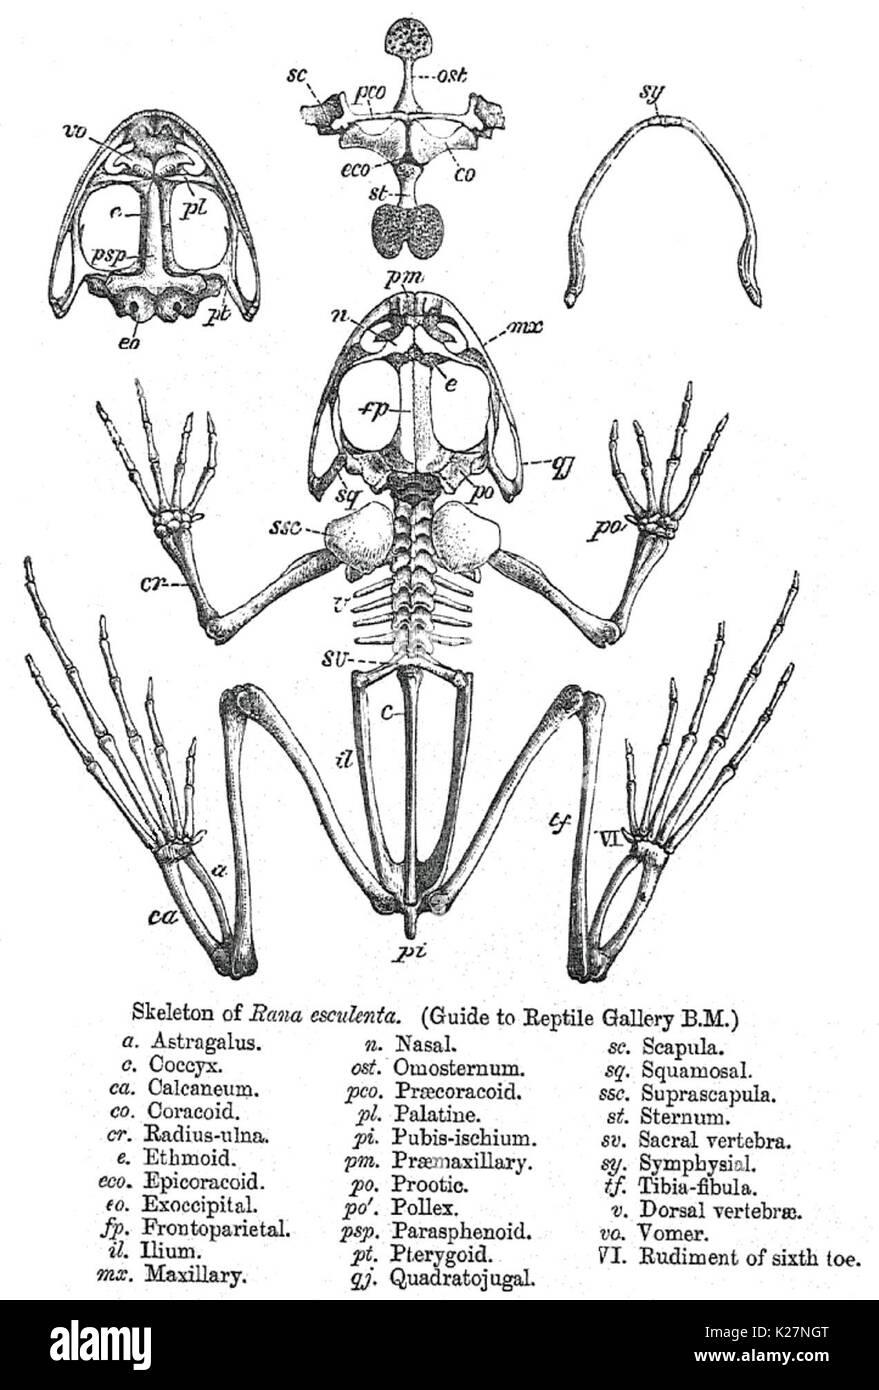 Skeleton of Pelophylax esculentus showing bones of the head, vertebral column, ribs, pectoral and pelvic girdles, and limbs 1890 - Stock Image